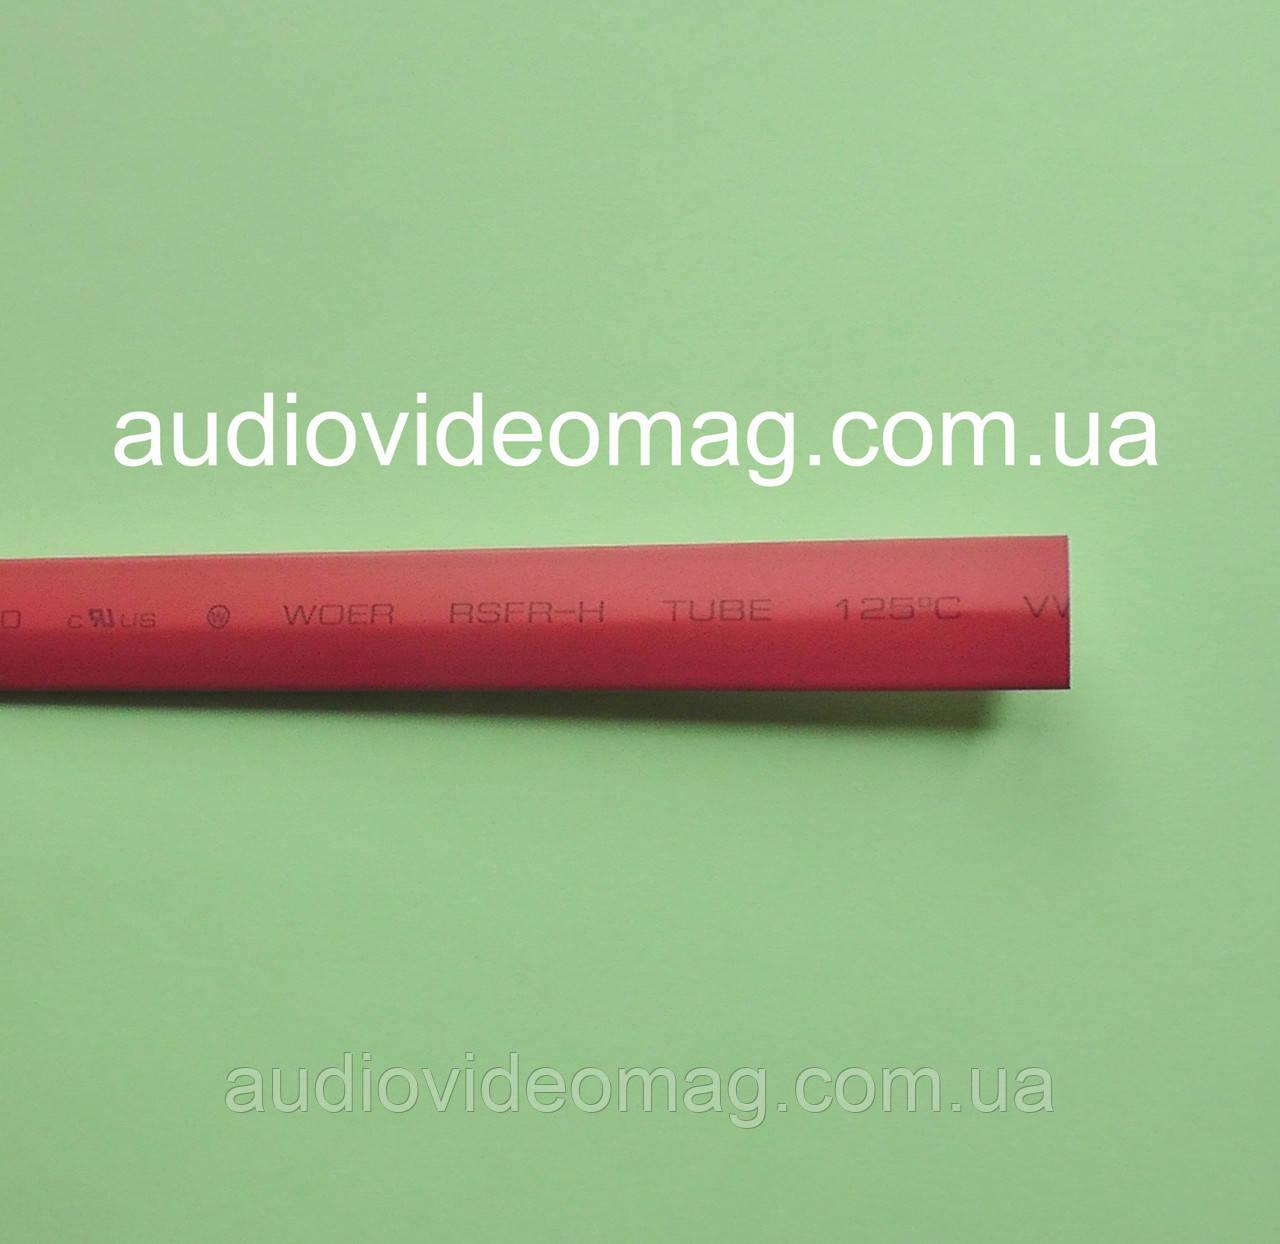 Термоусадочна трубка (2:1) - 8.0/4.0 мм, 1 метр, червона